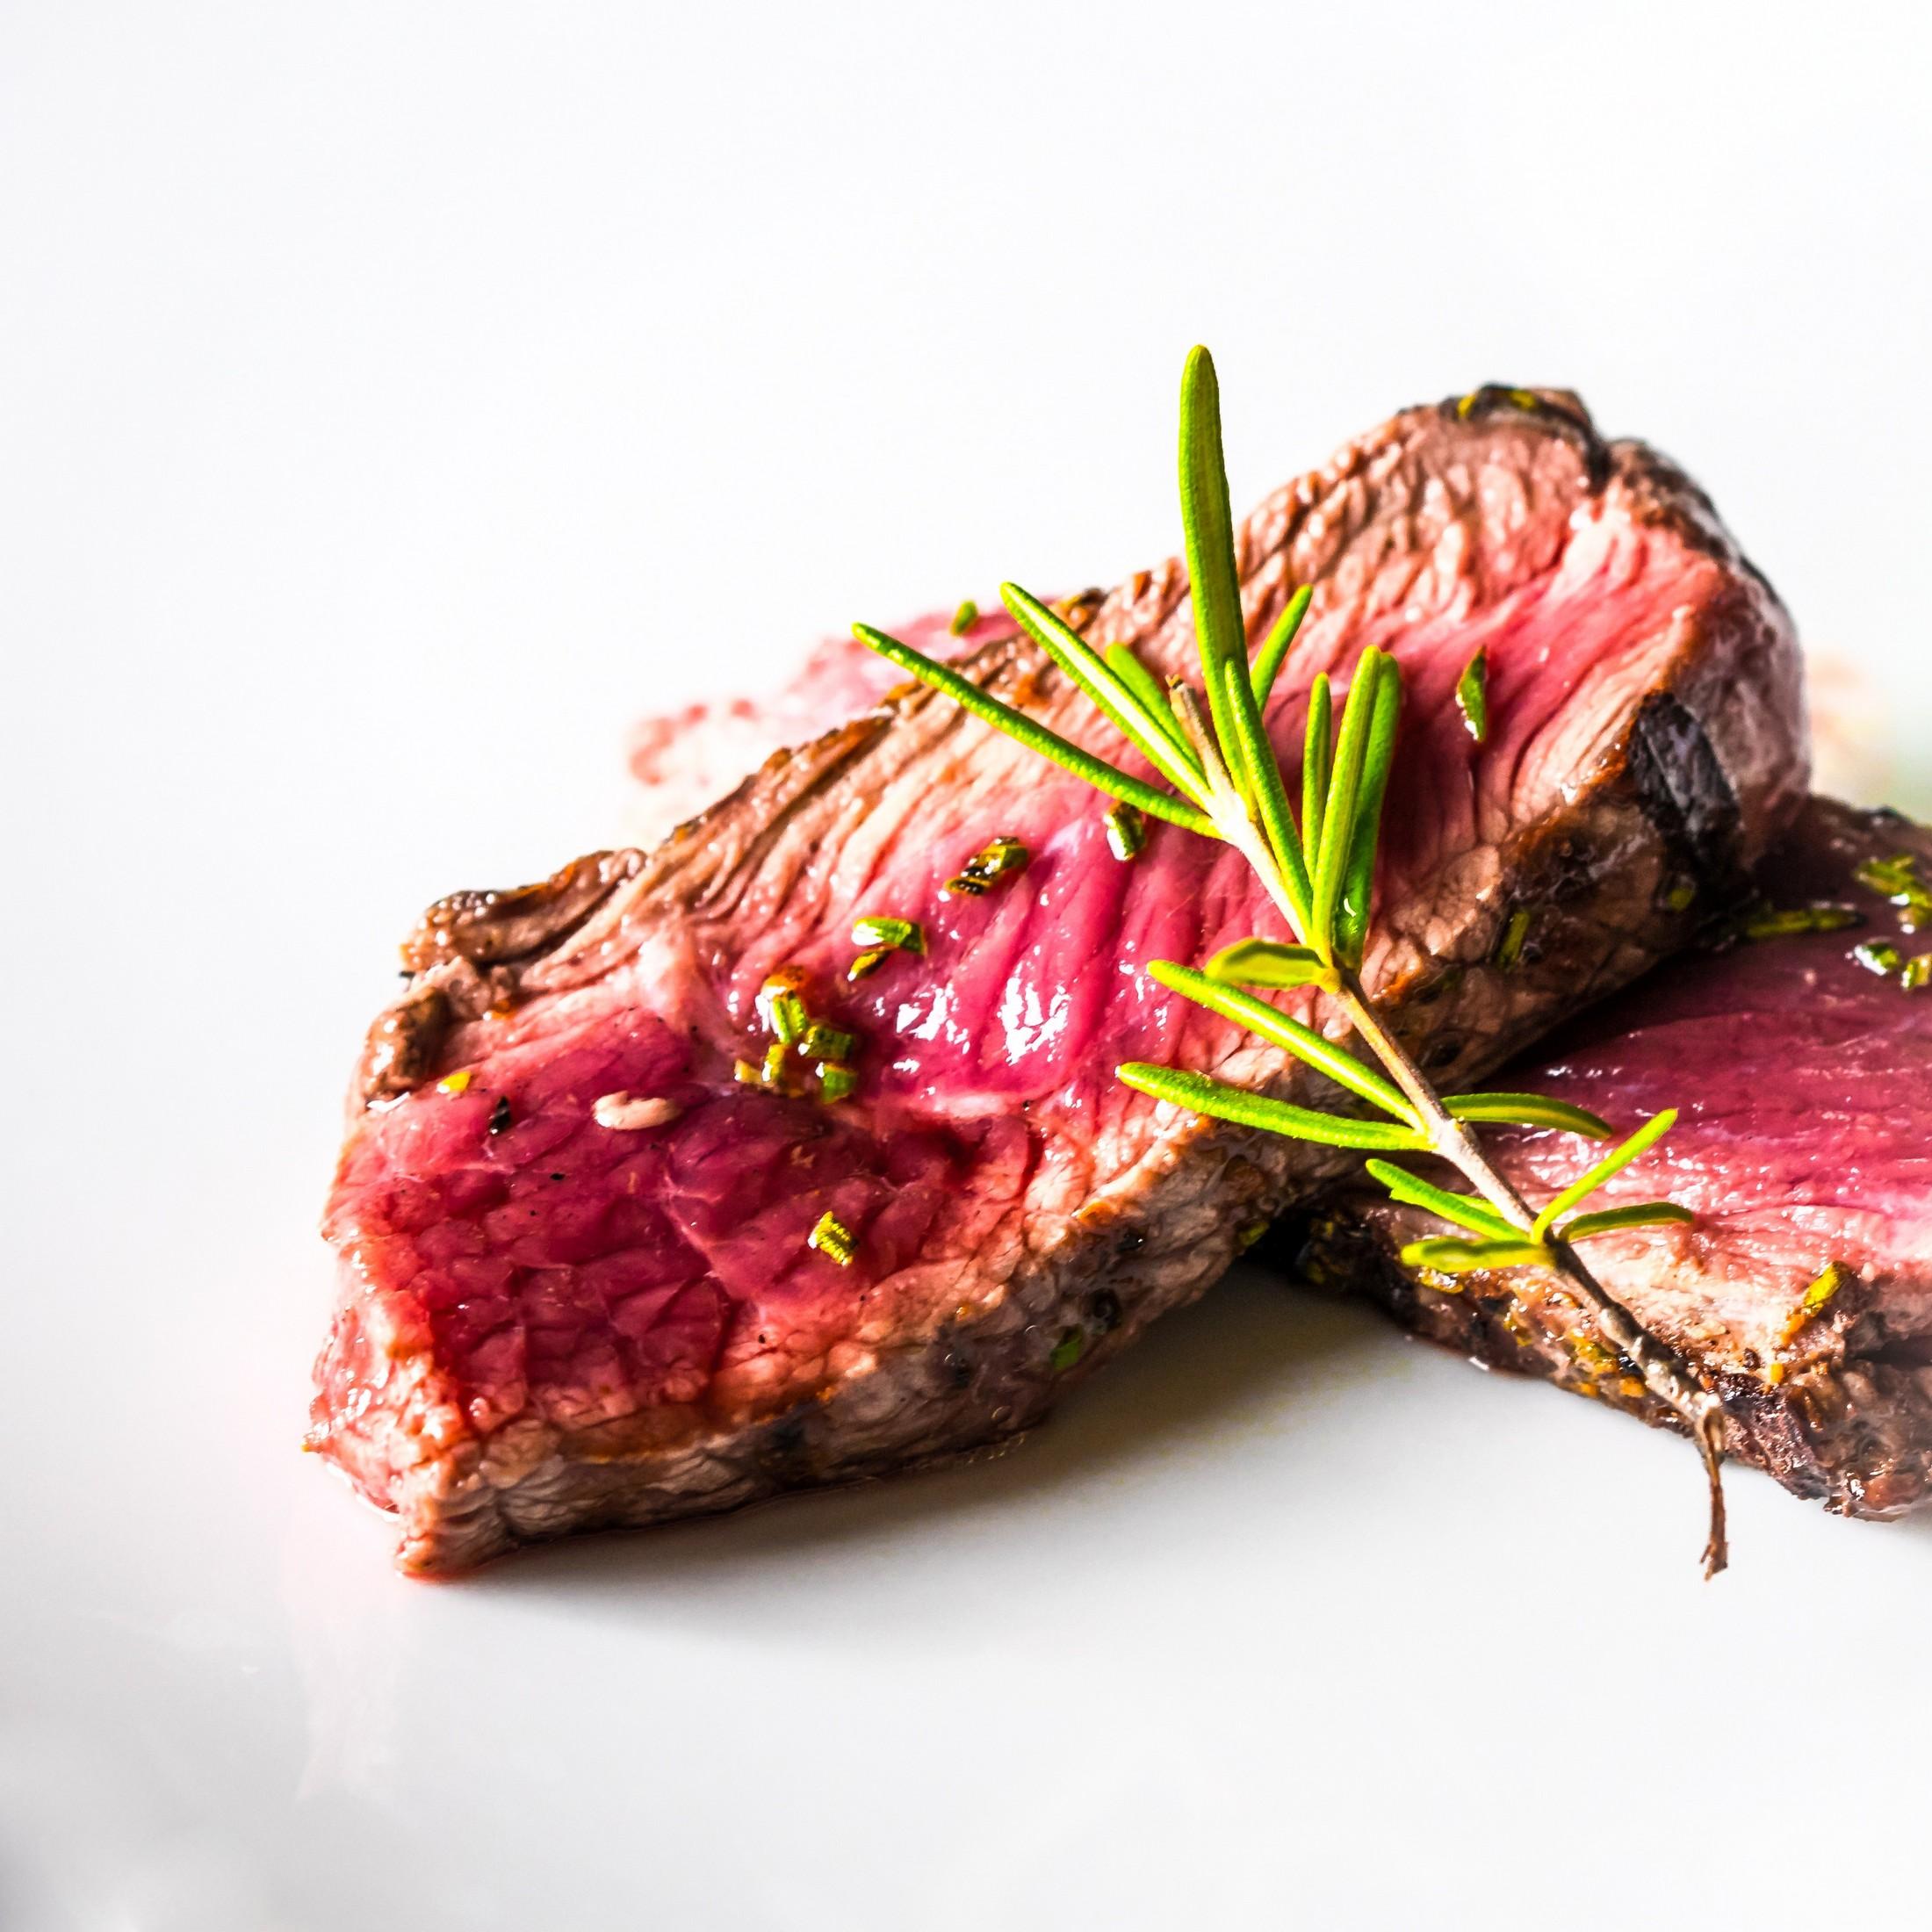 Carne filetes